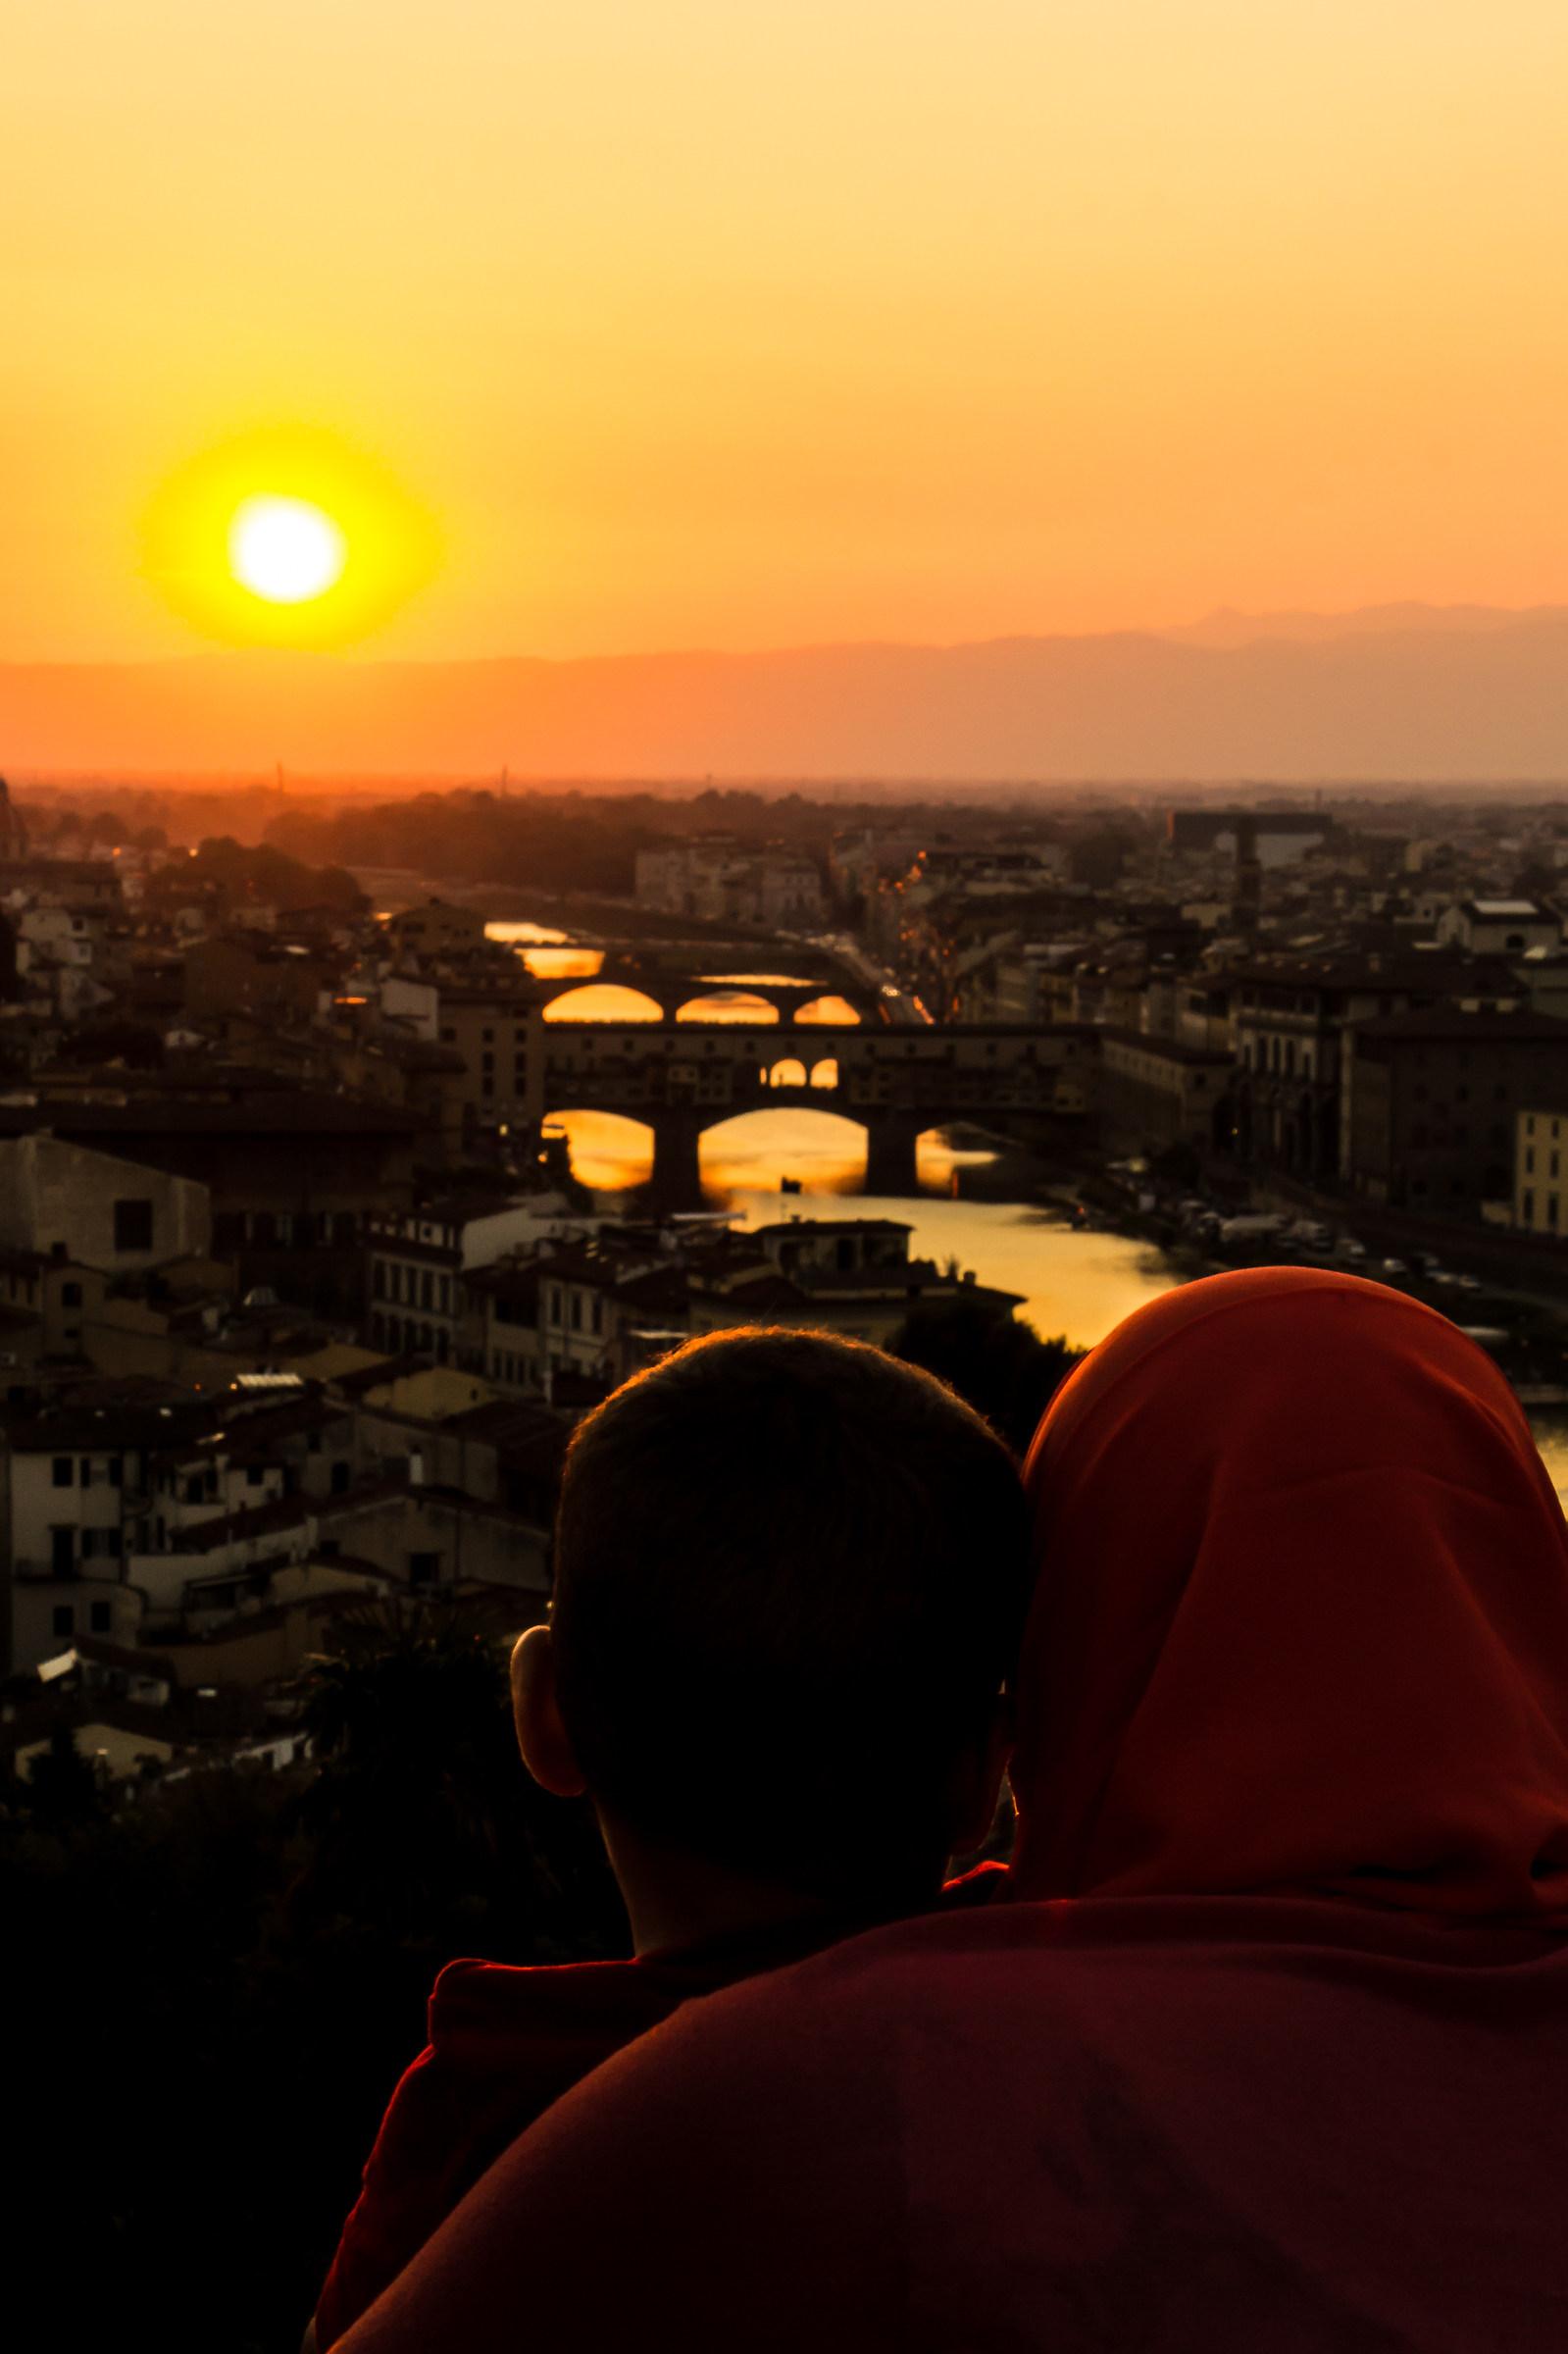 Their sunset...